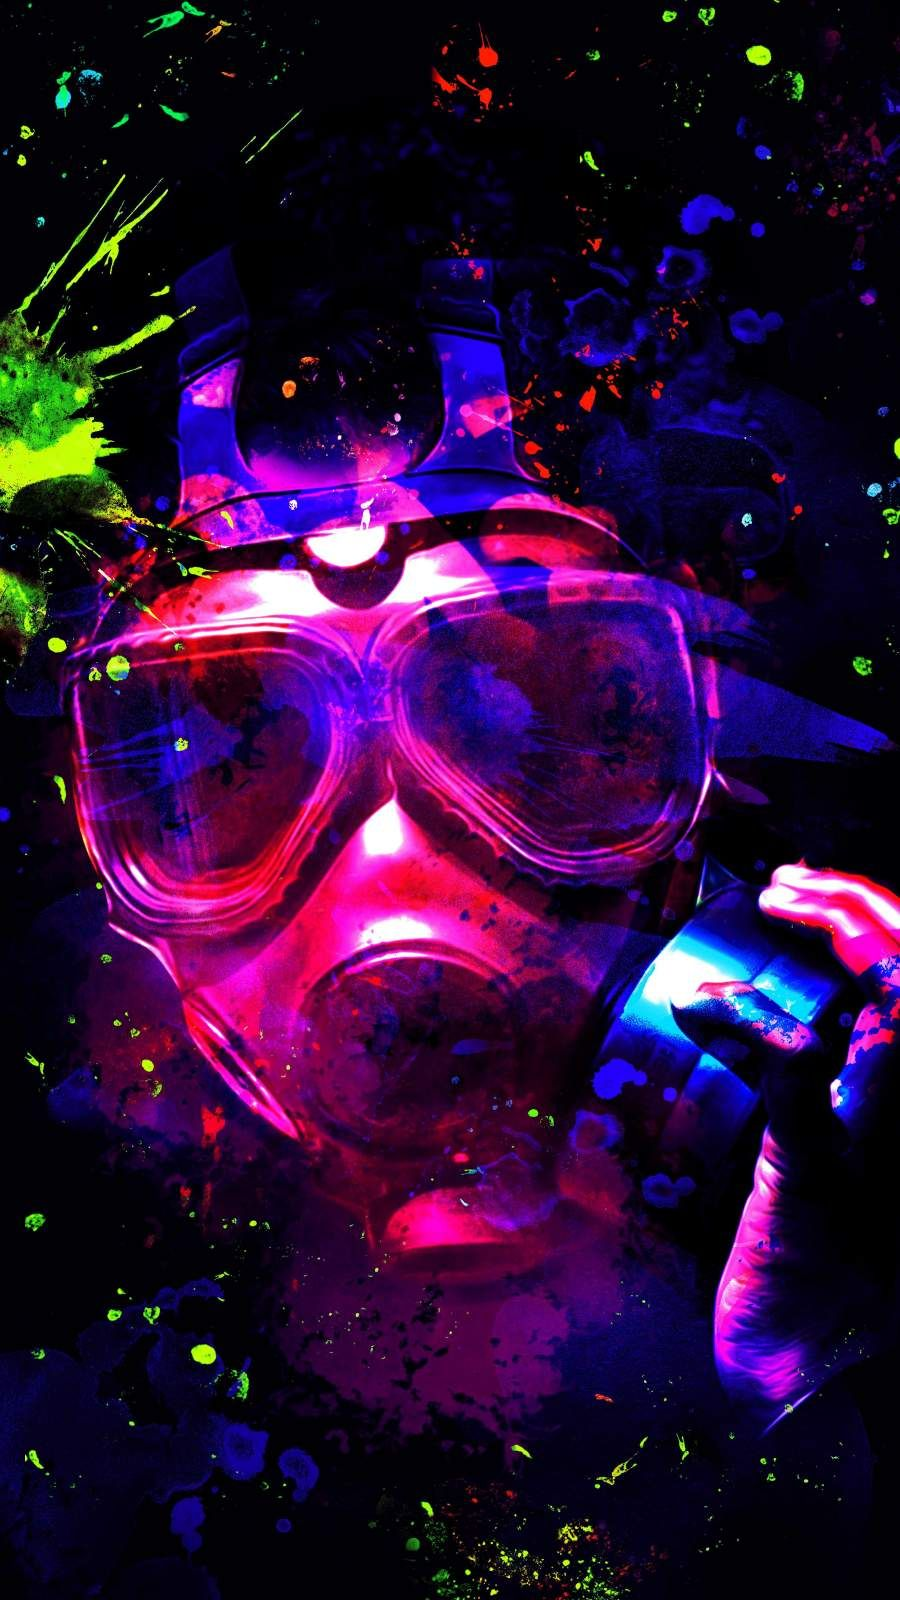 Colorful Mask iPhone Wallpaper Wallpaper iphone